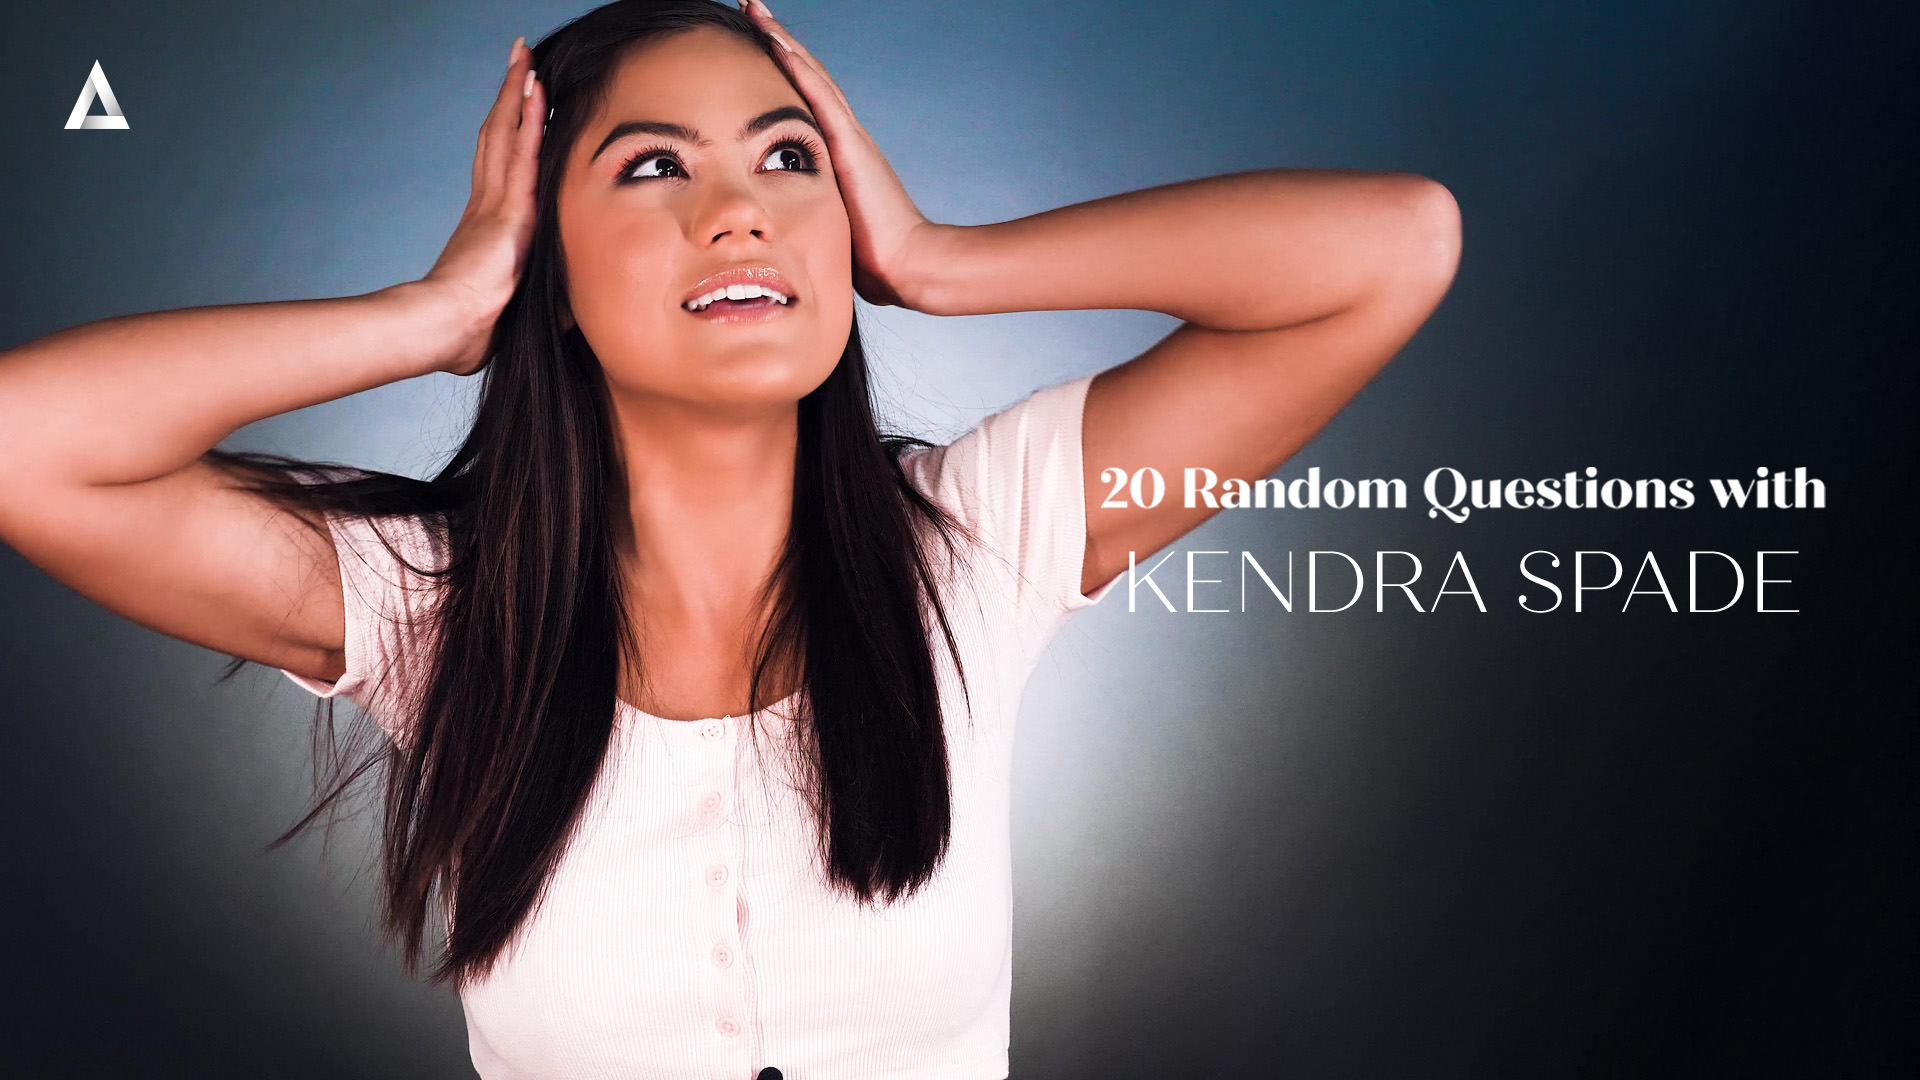 20 Random Questions with Kendra Spade - Kendra Spade 1